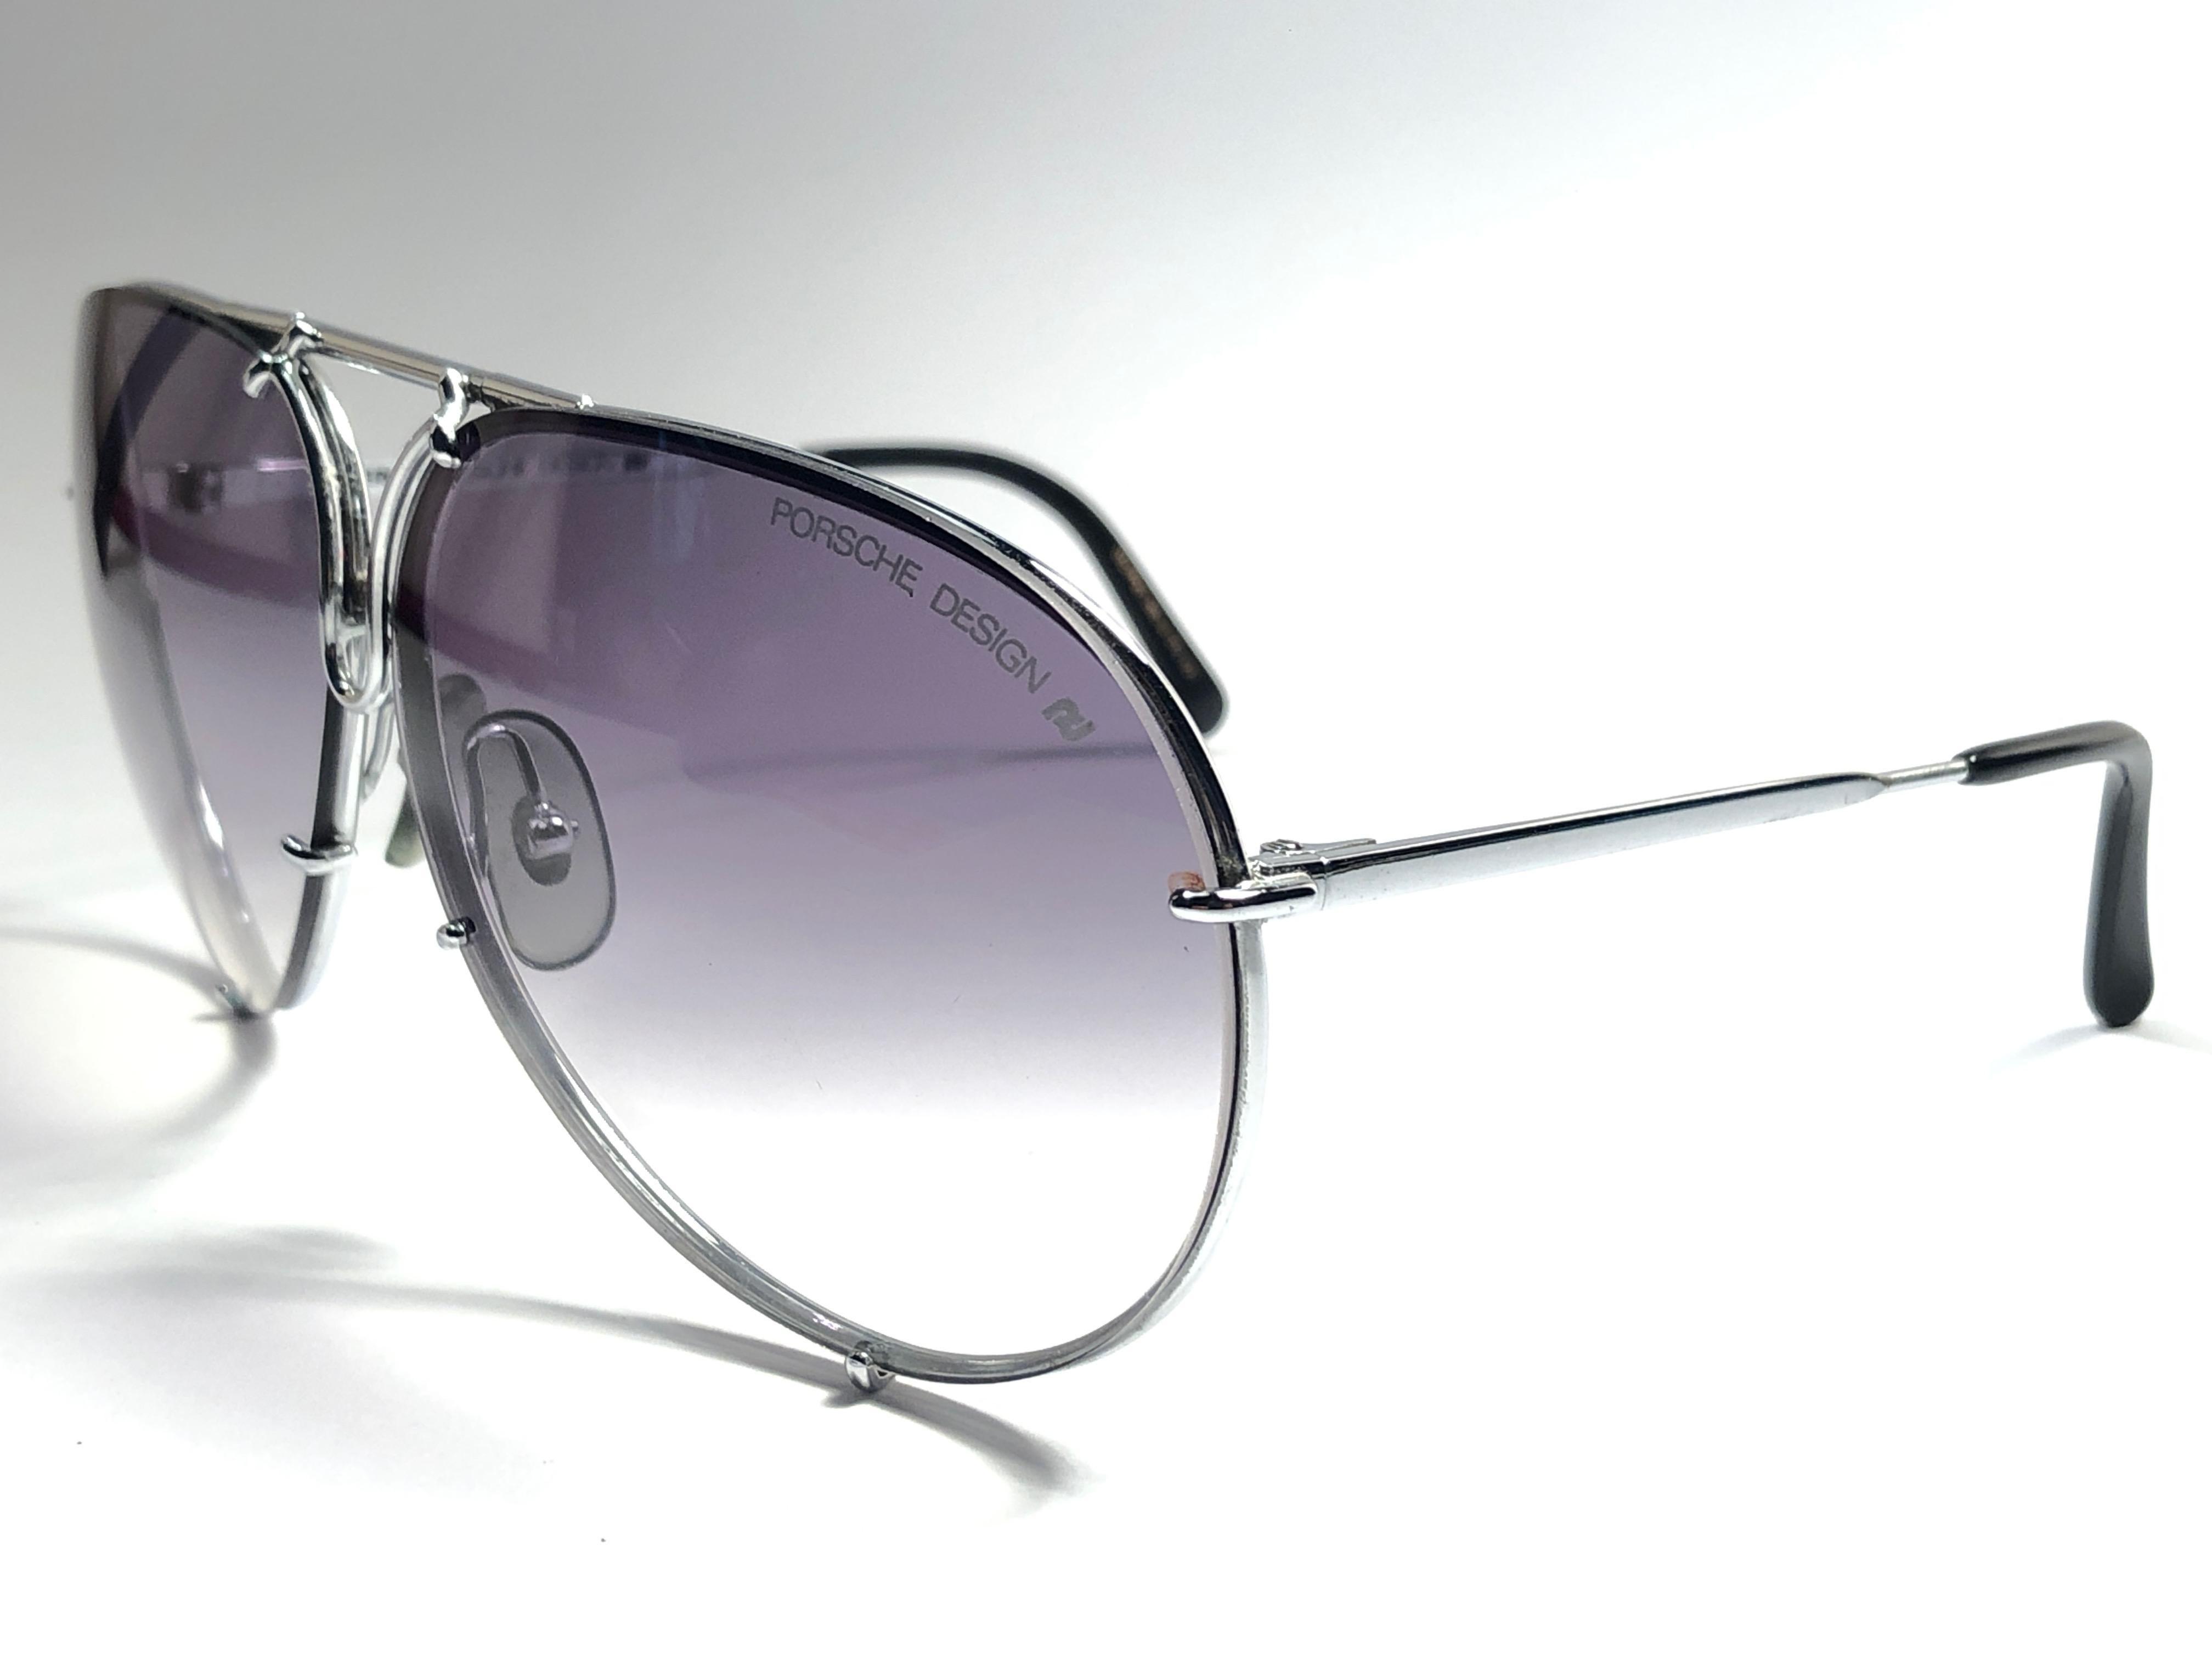 6788bd5b28 New Vintage Porsche Design 5623 Silver Oversized Aviator Sunglasses Austria  For Sale at 1stdibs